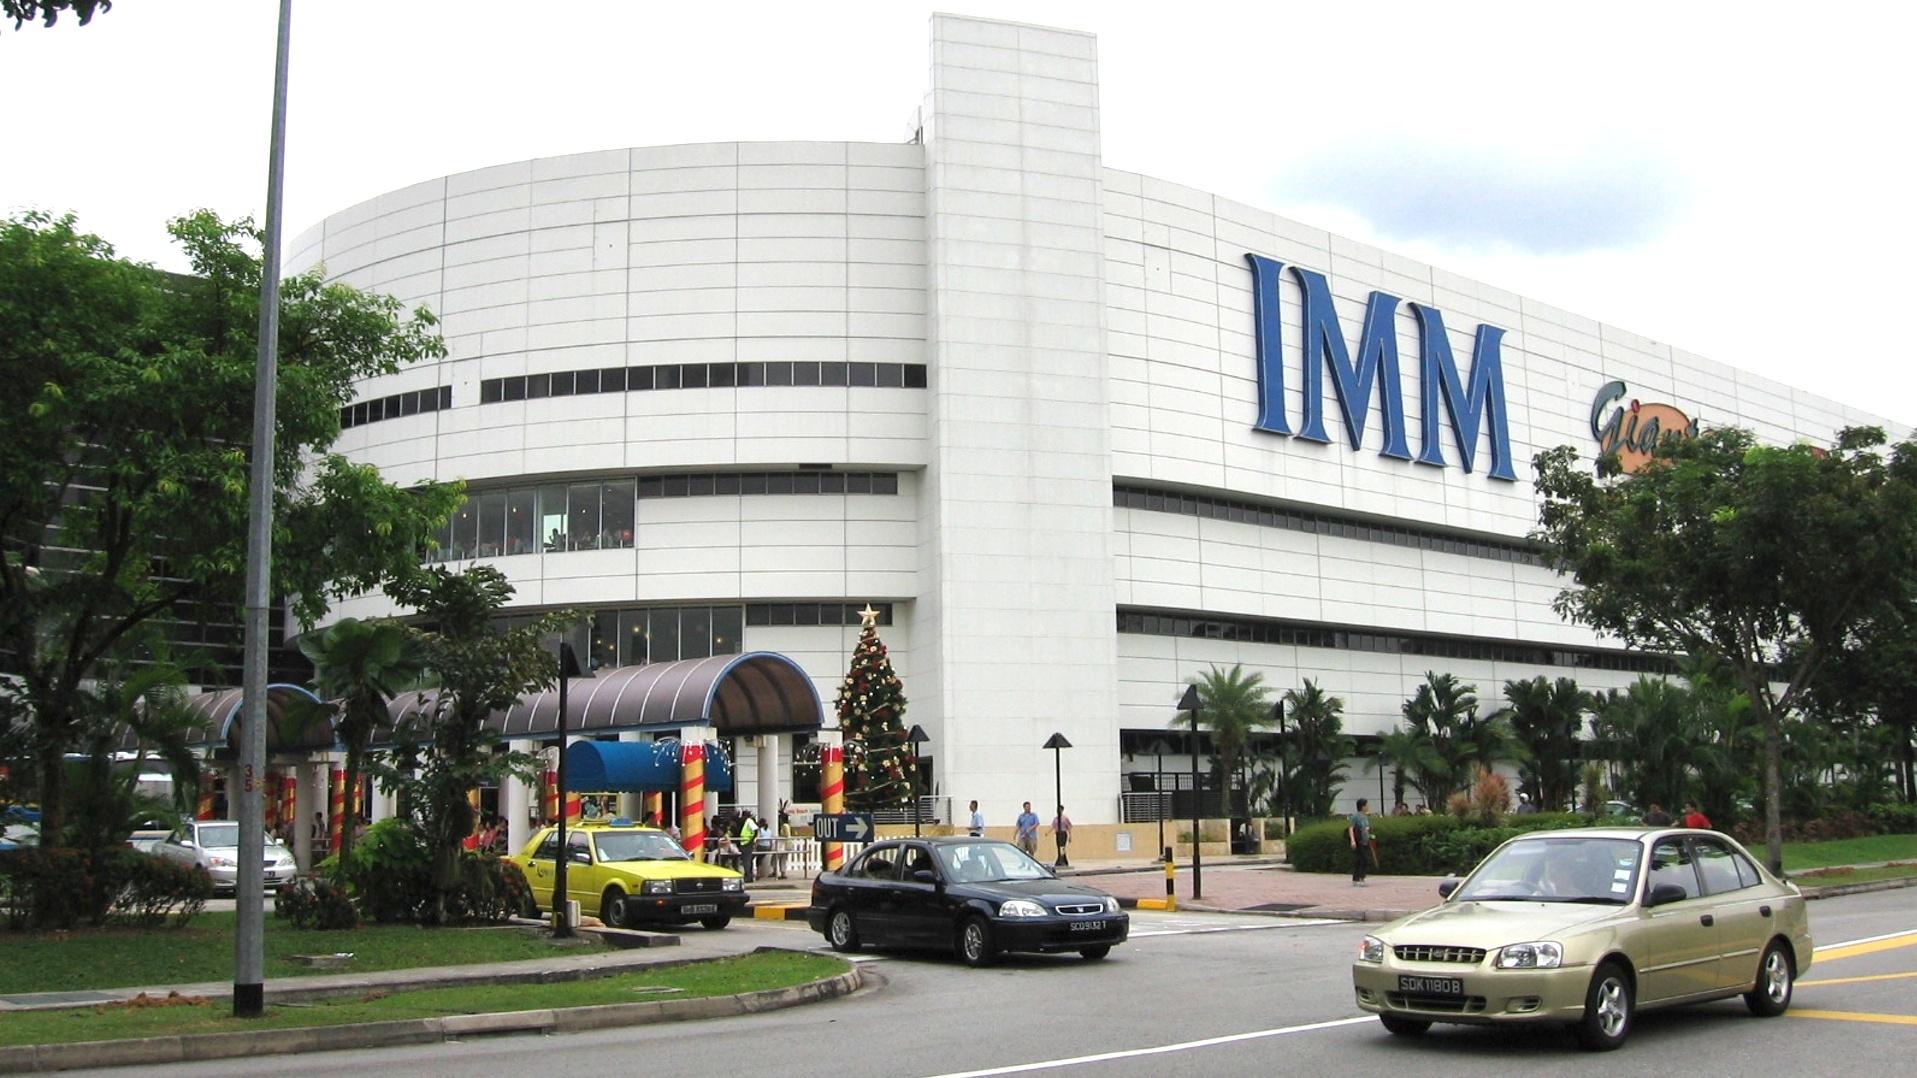 IMM Shopping Mall